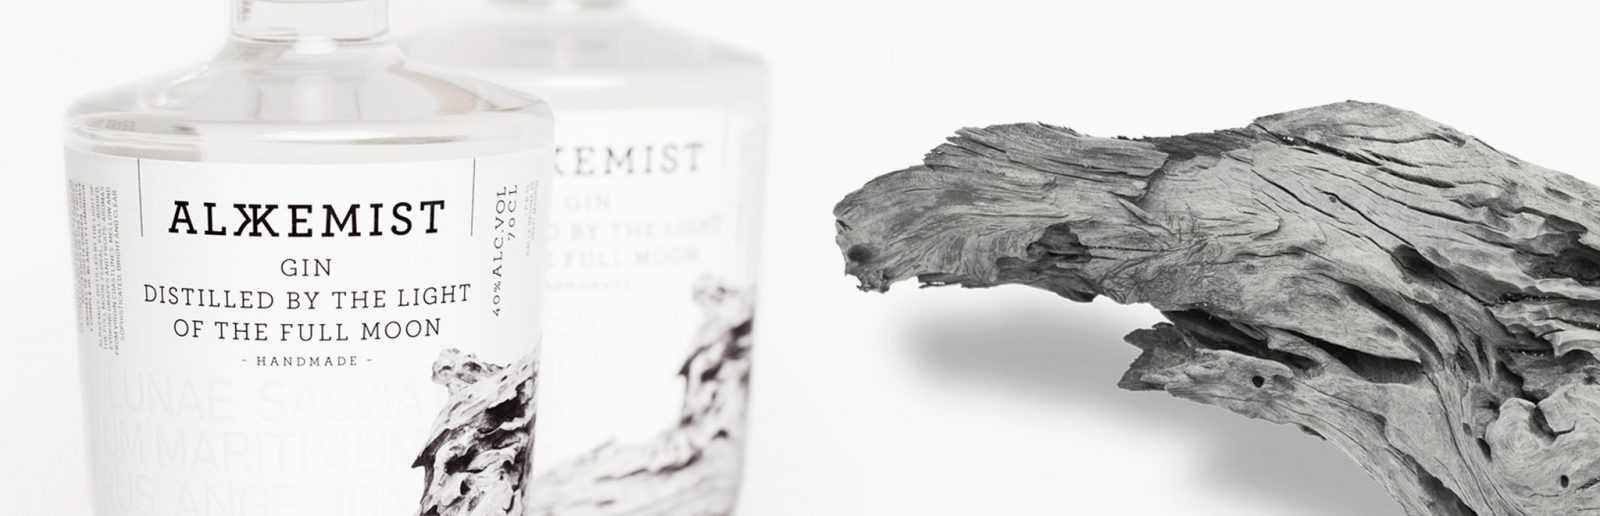 ALKKEMIST, la primera ginebra elaborada con hinojo marino y uva moscatel.